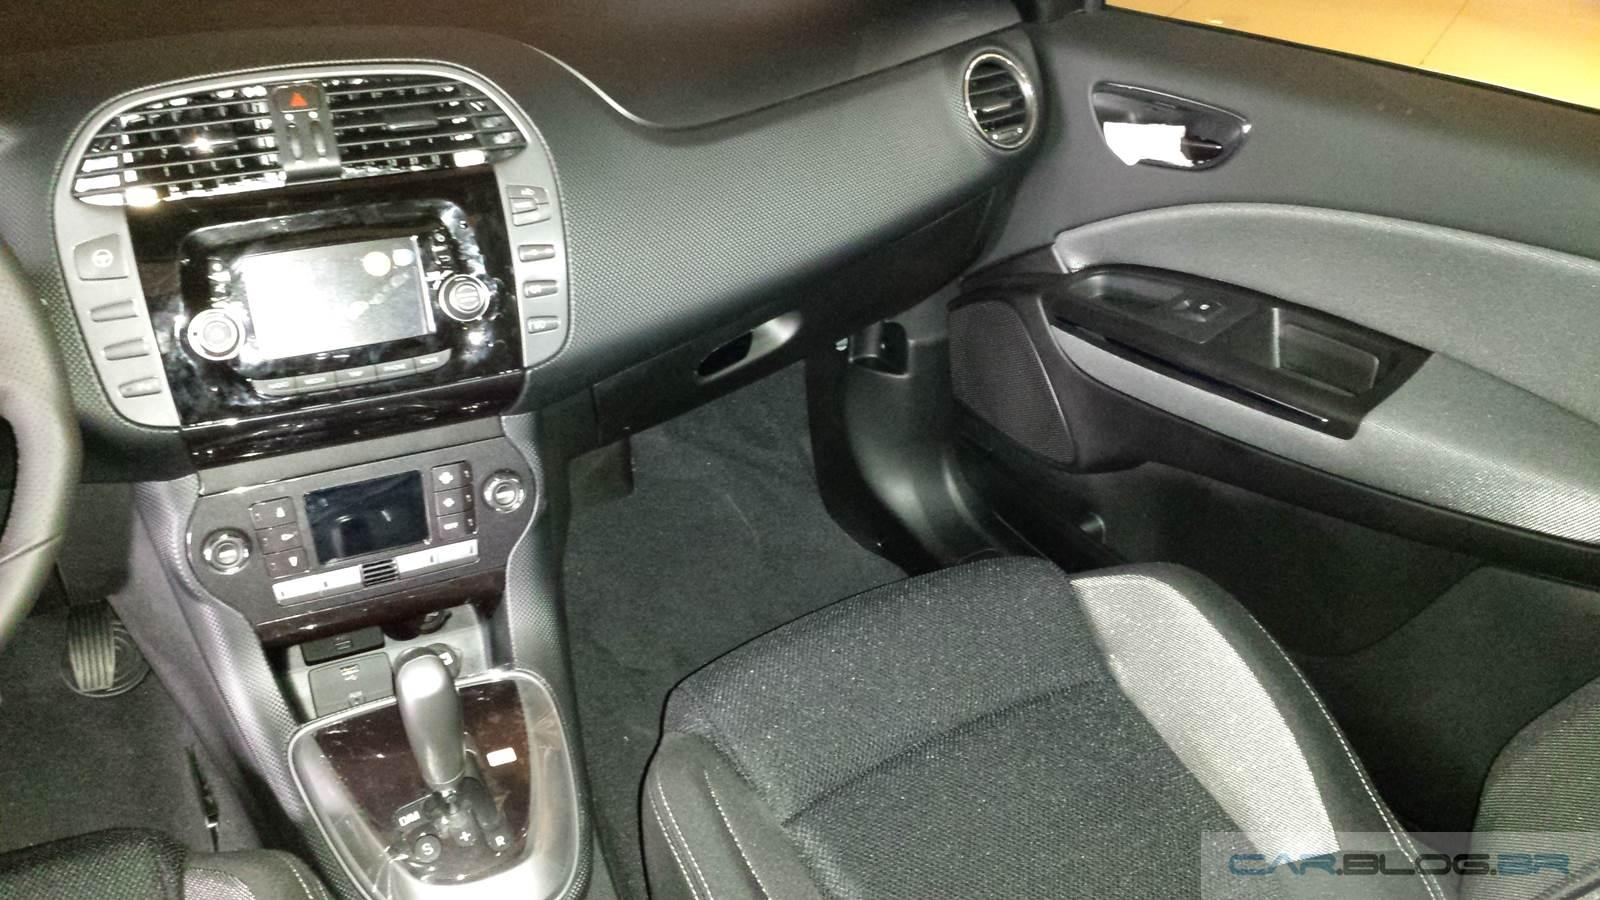 Fiat Bravo Sporting 2016 Preto Vesúvio Dualogic - interior